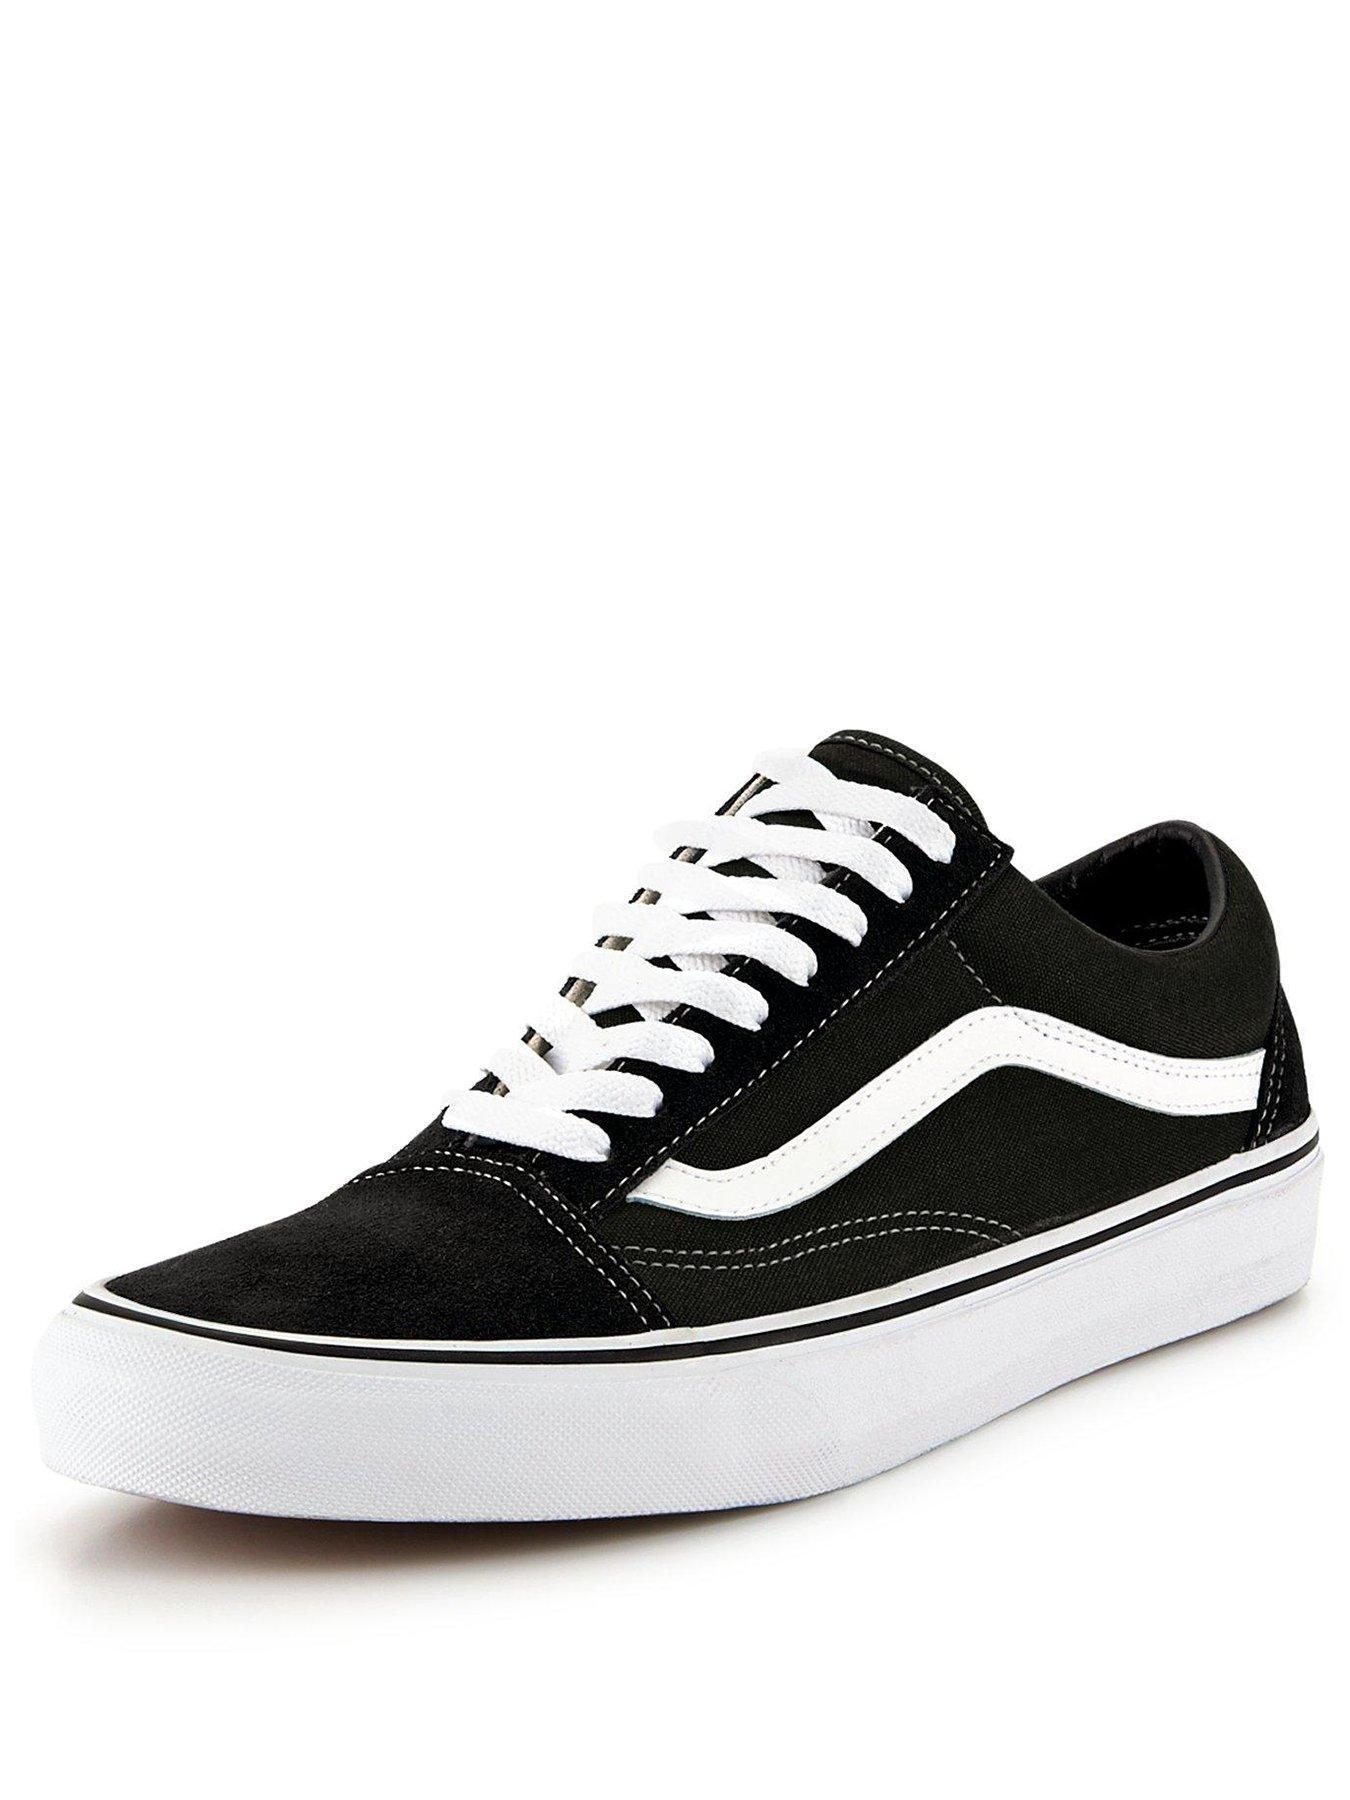 vans womens shoes uk